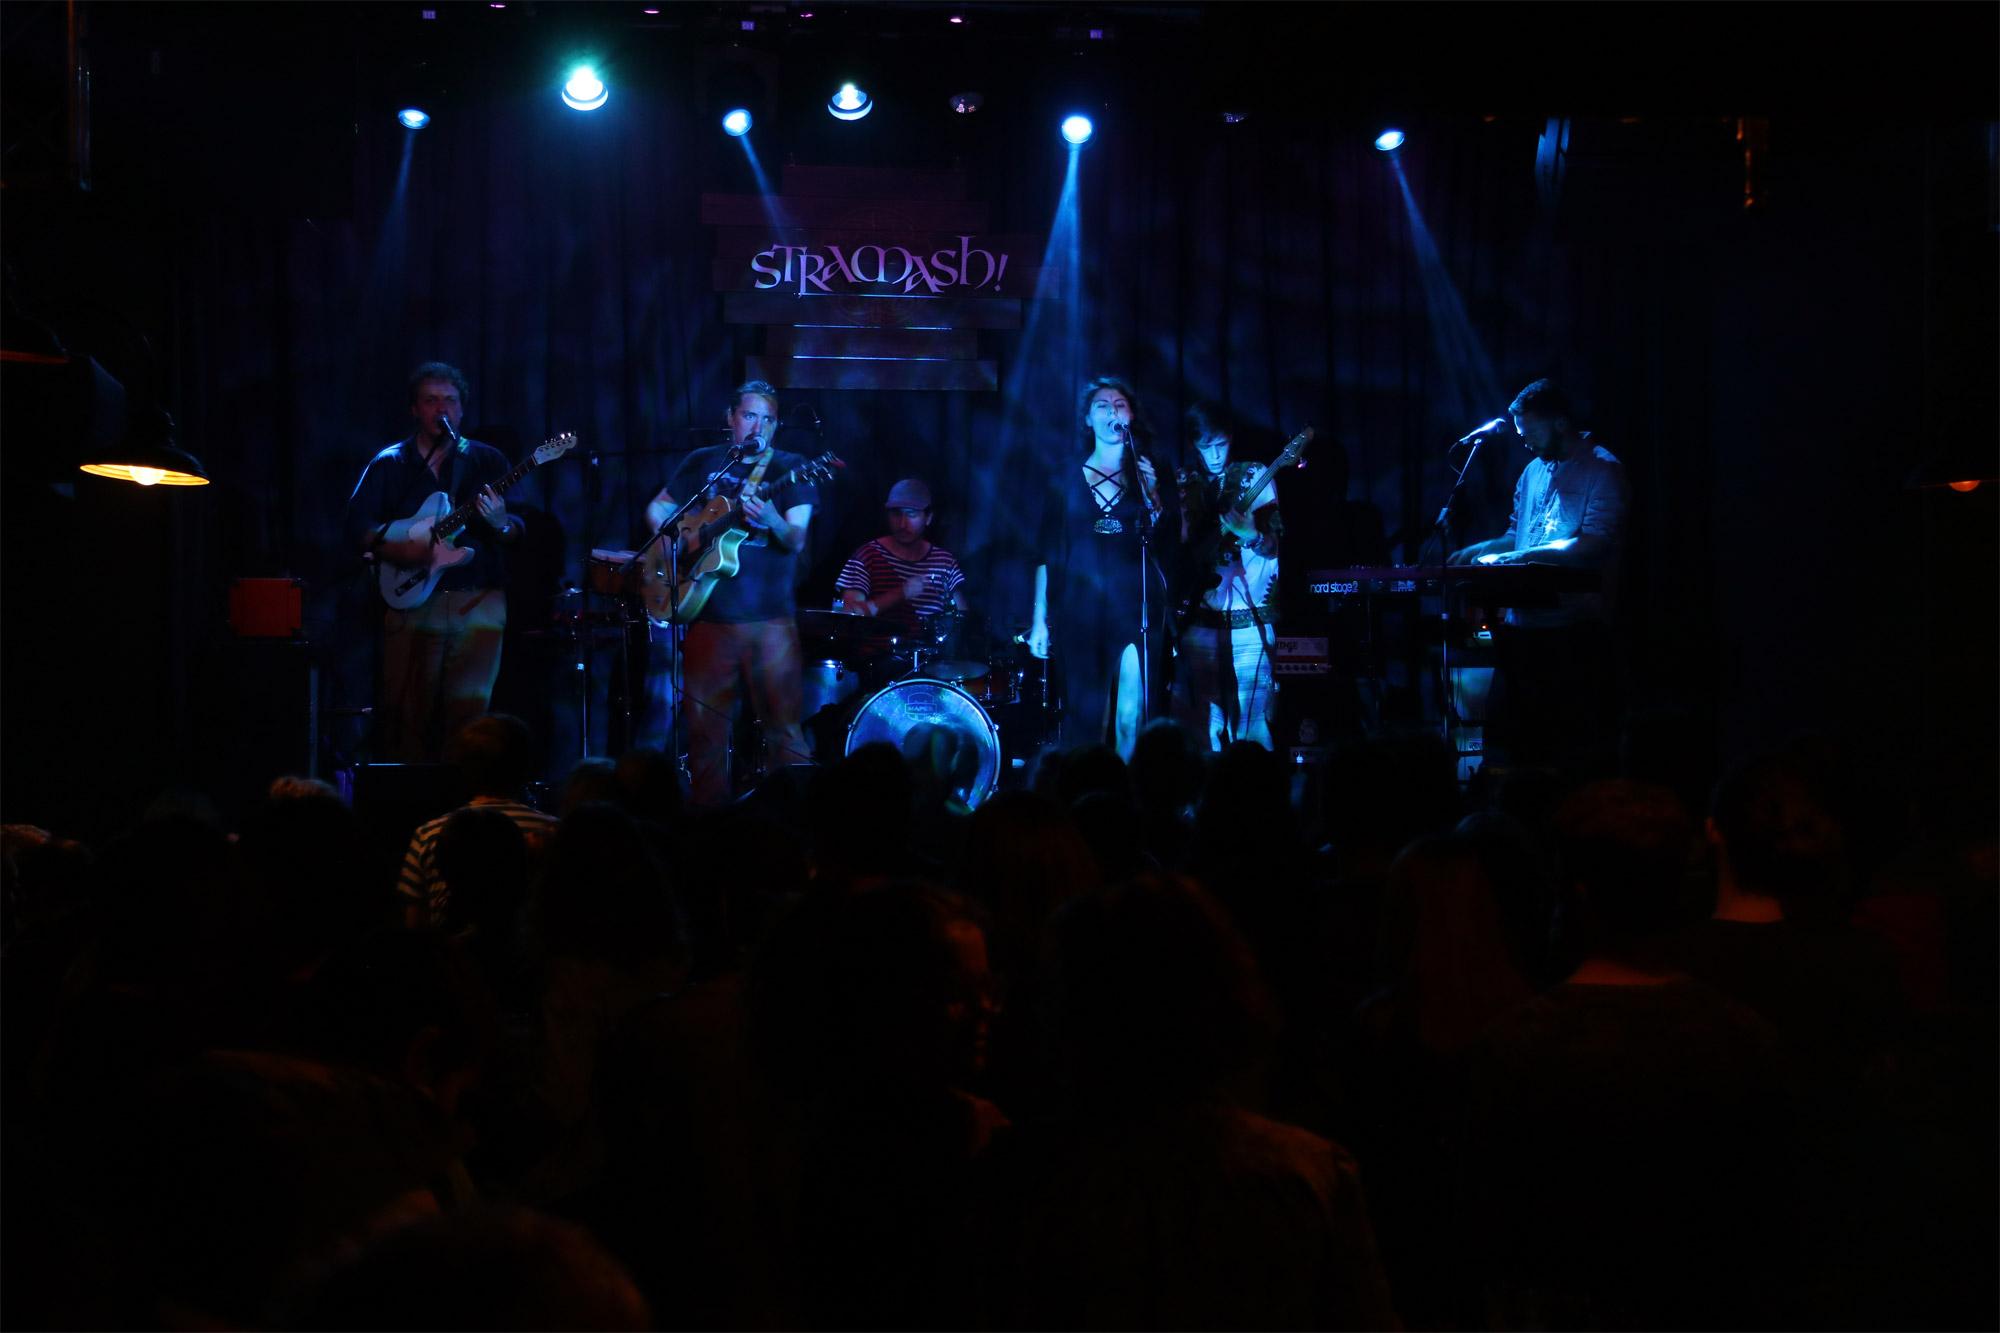 Mannenweekend in Edinburgh - Live muziek bij Stramash